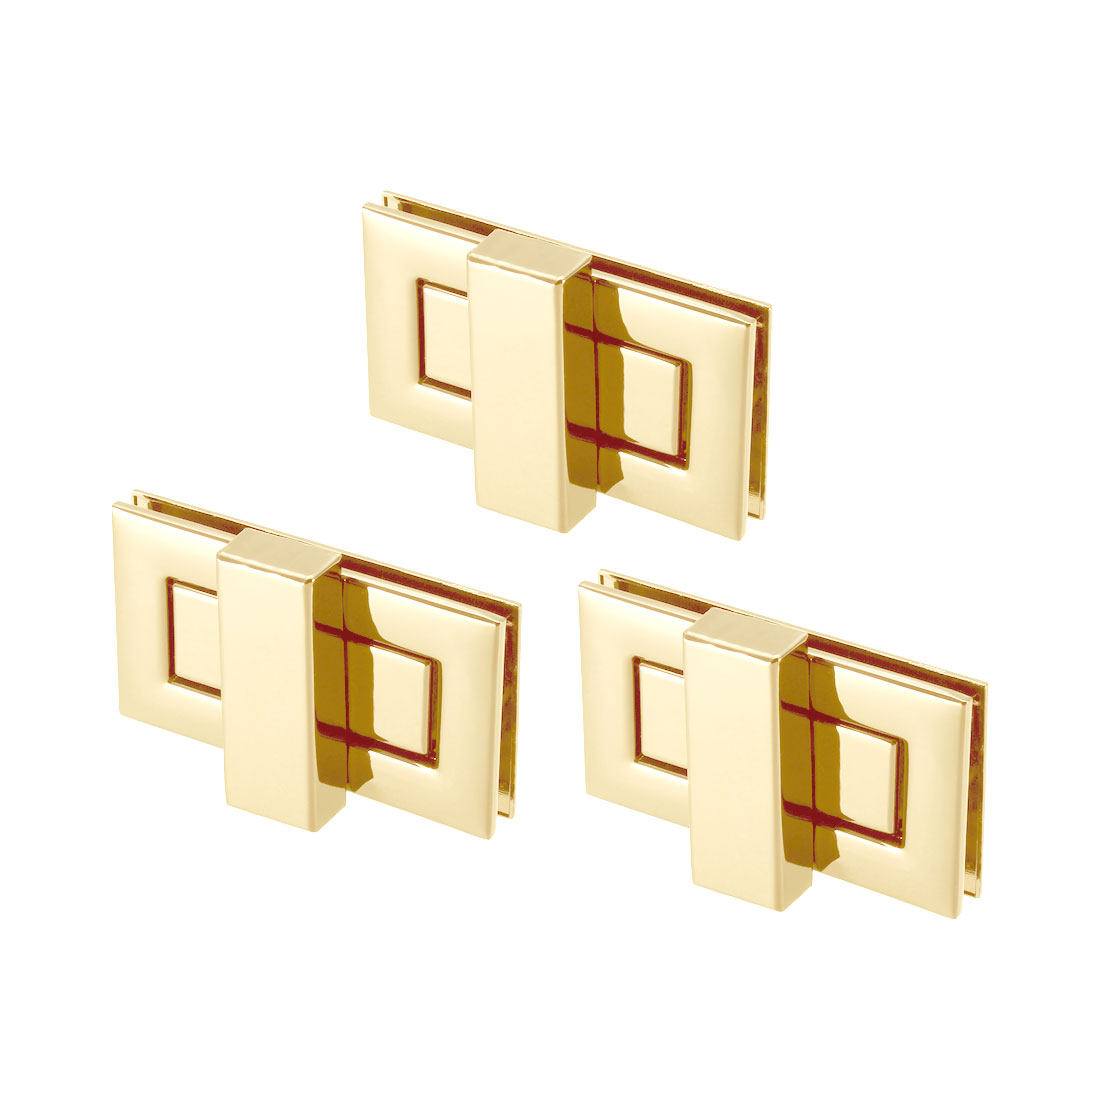 3 Sets Rectangular Purses Twist Lock 52mm x 29mm Clutches Closures - Light Gold